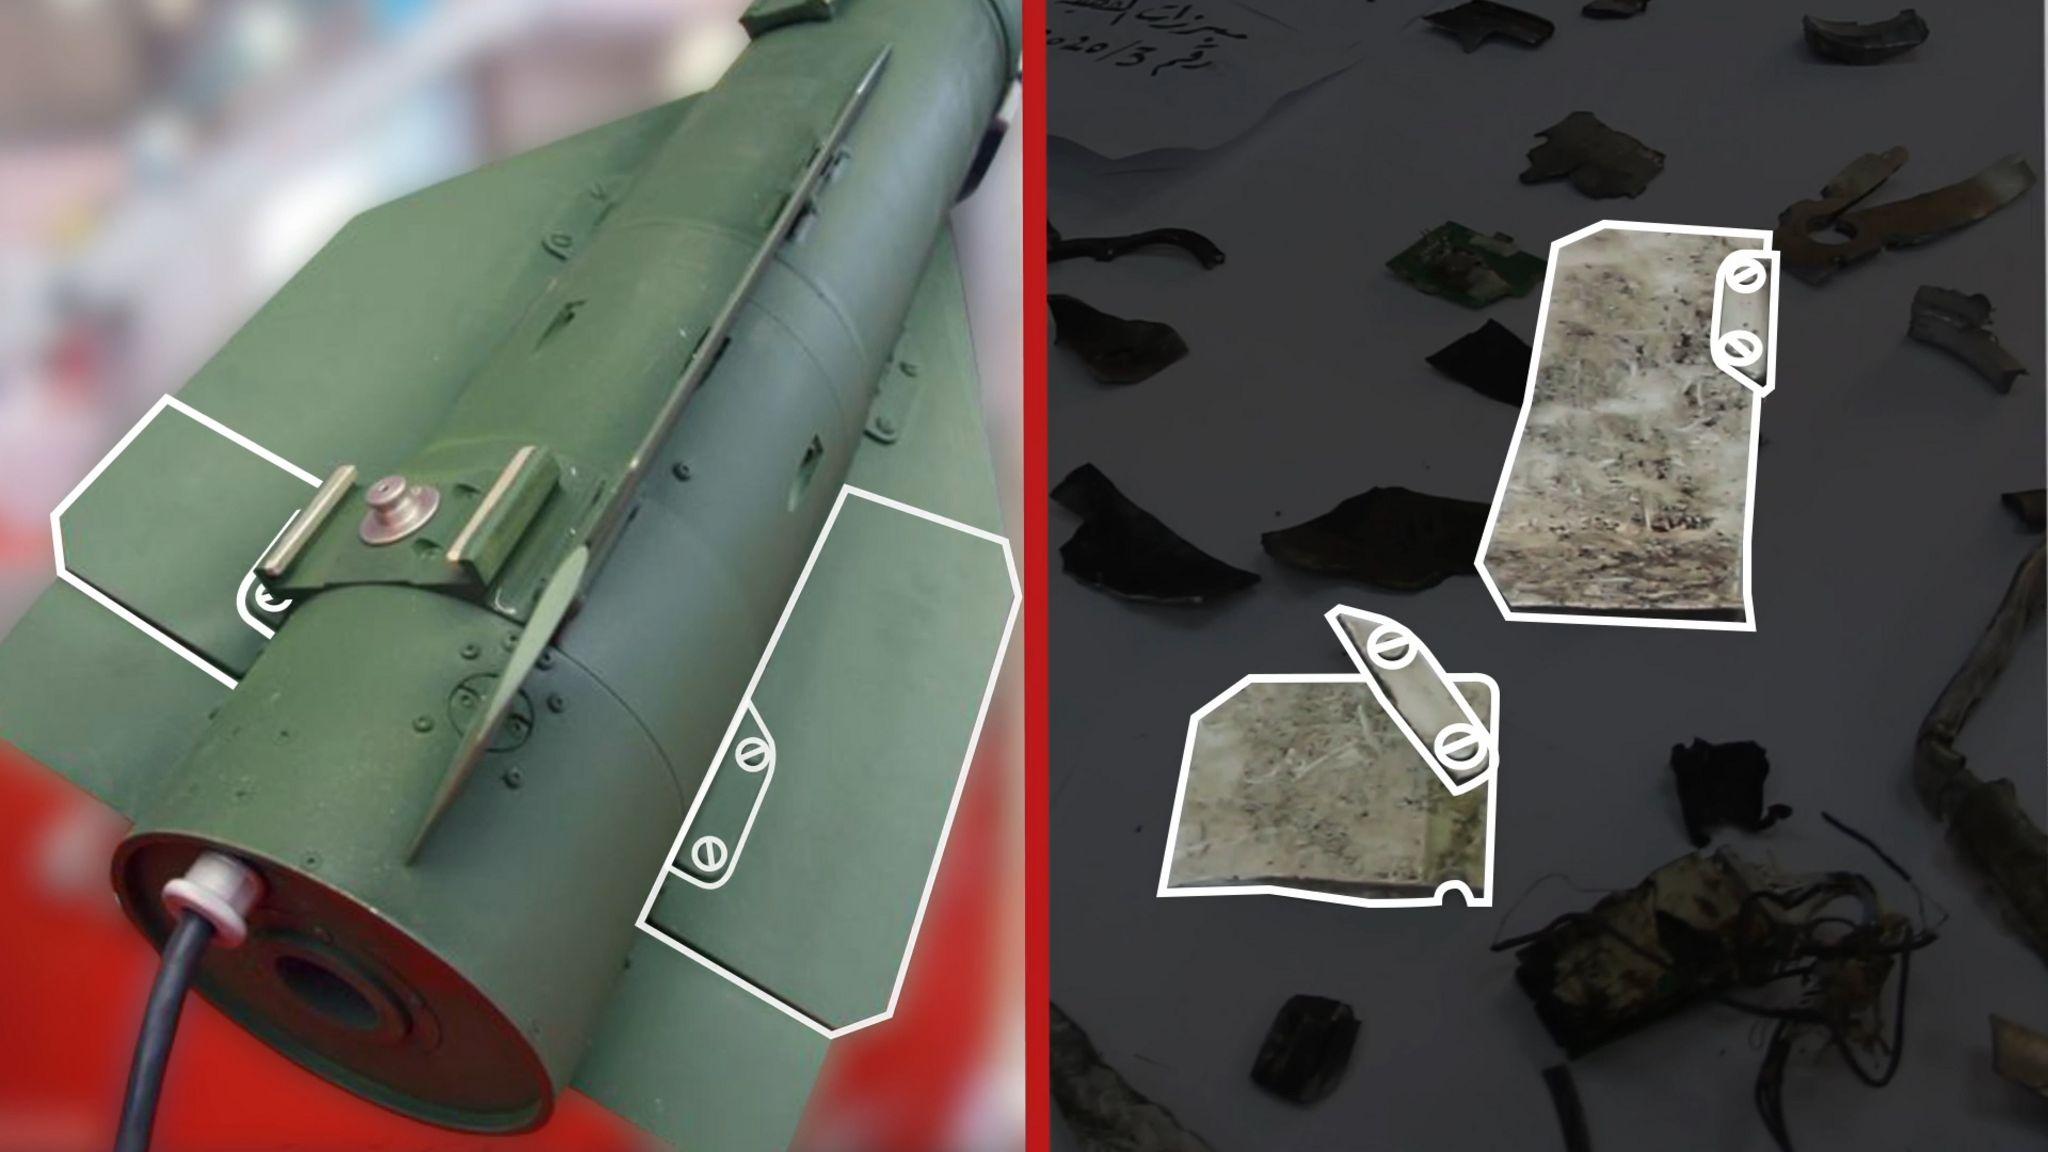 Images of the shrapnel